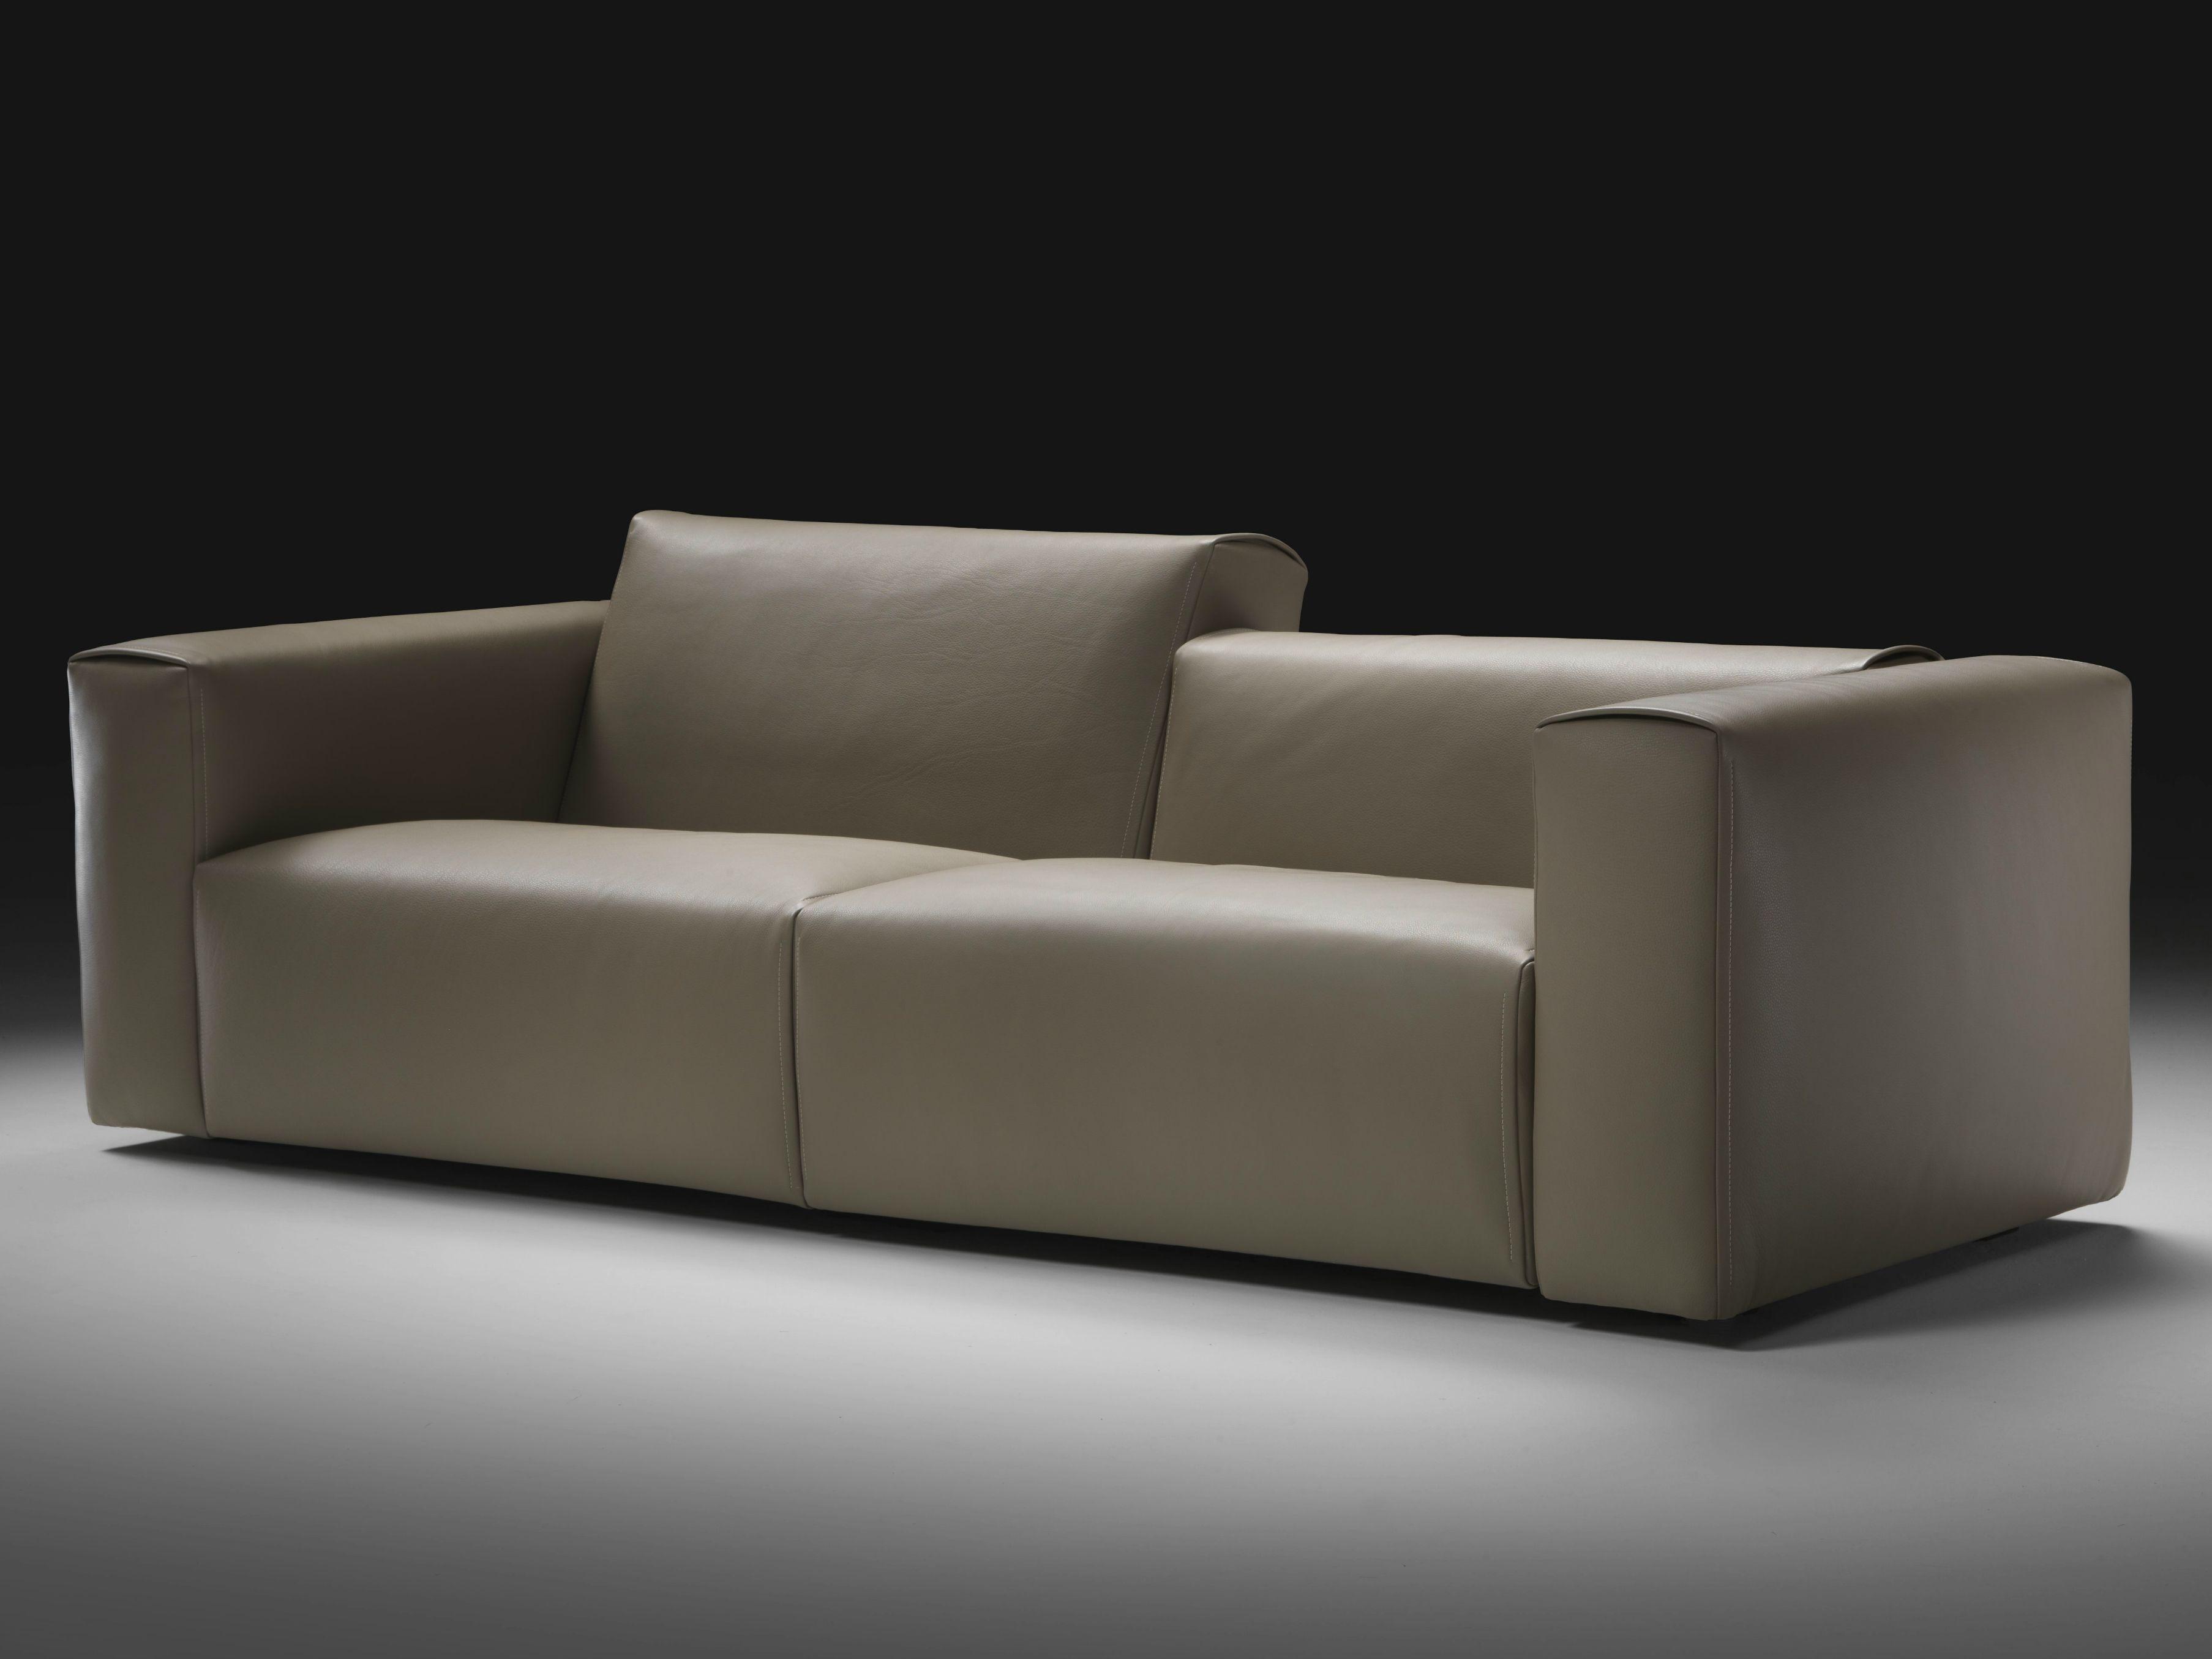 Valencia leather recliner sofa uk sofa review - Sofas a medida valencia ...